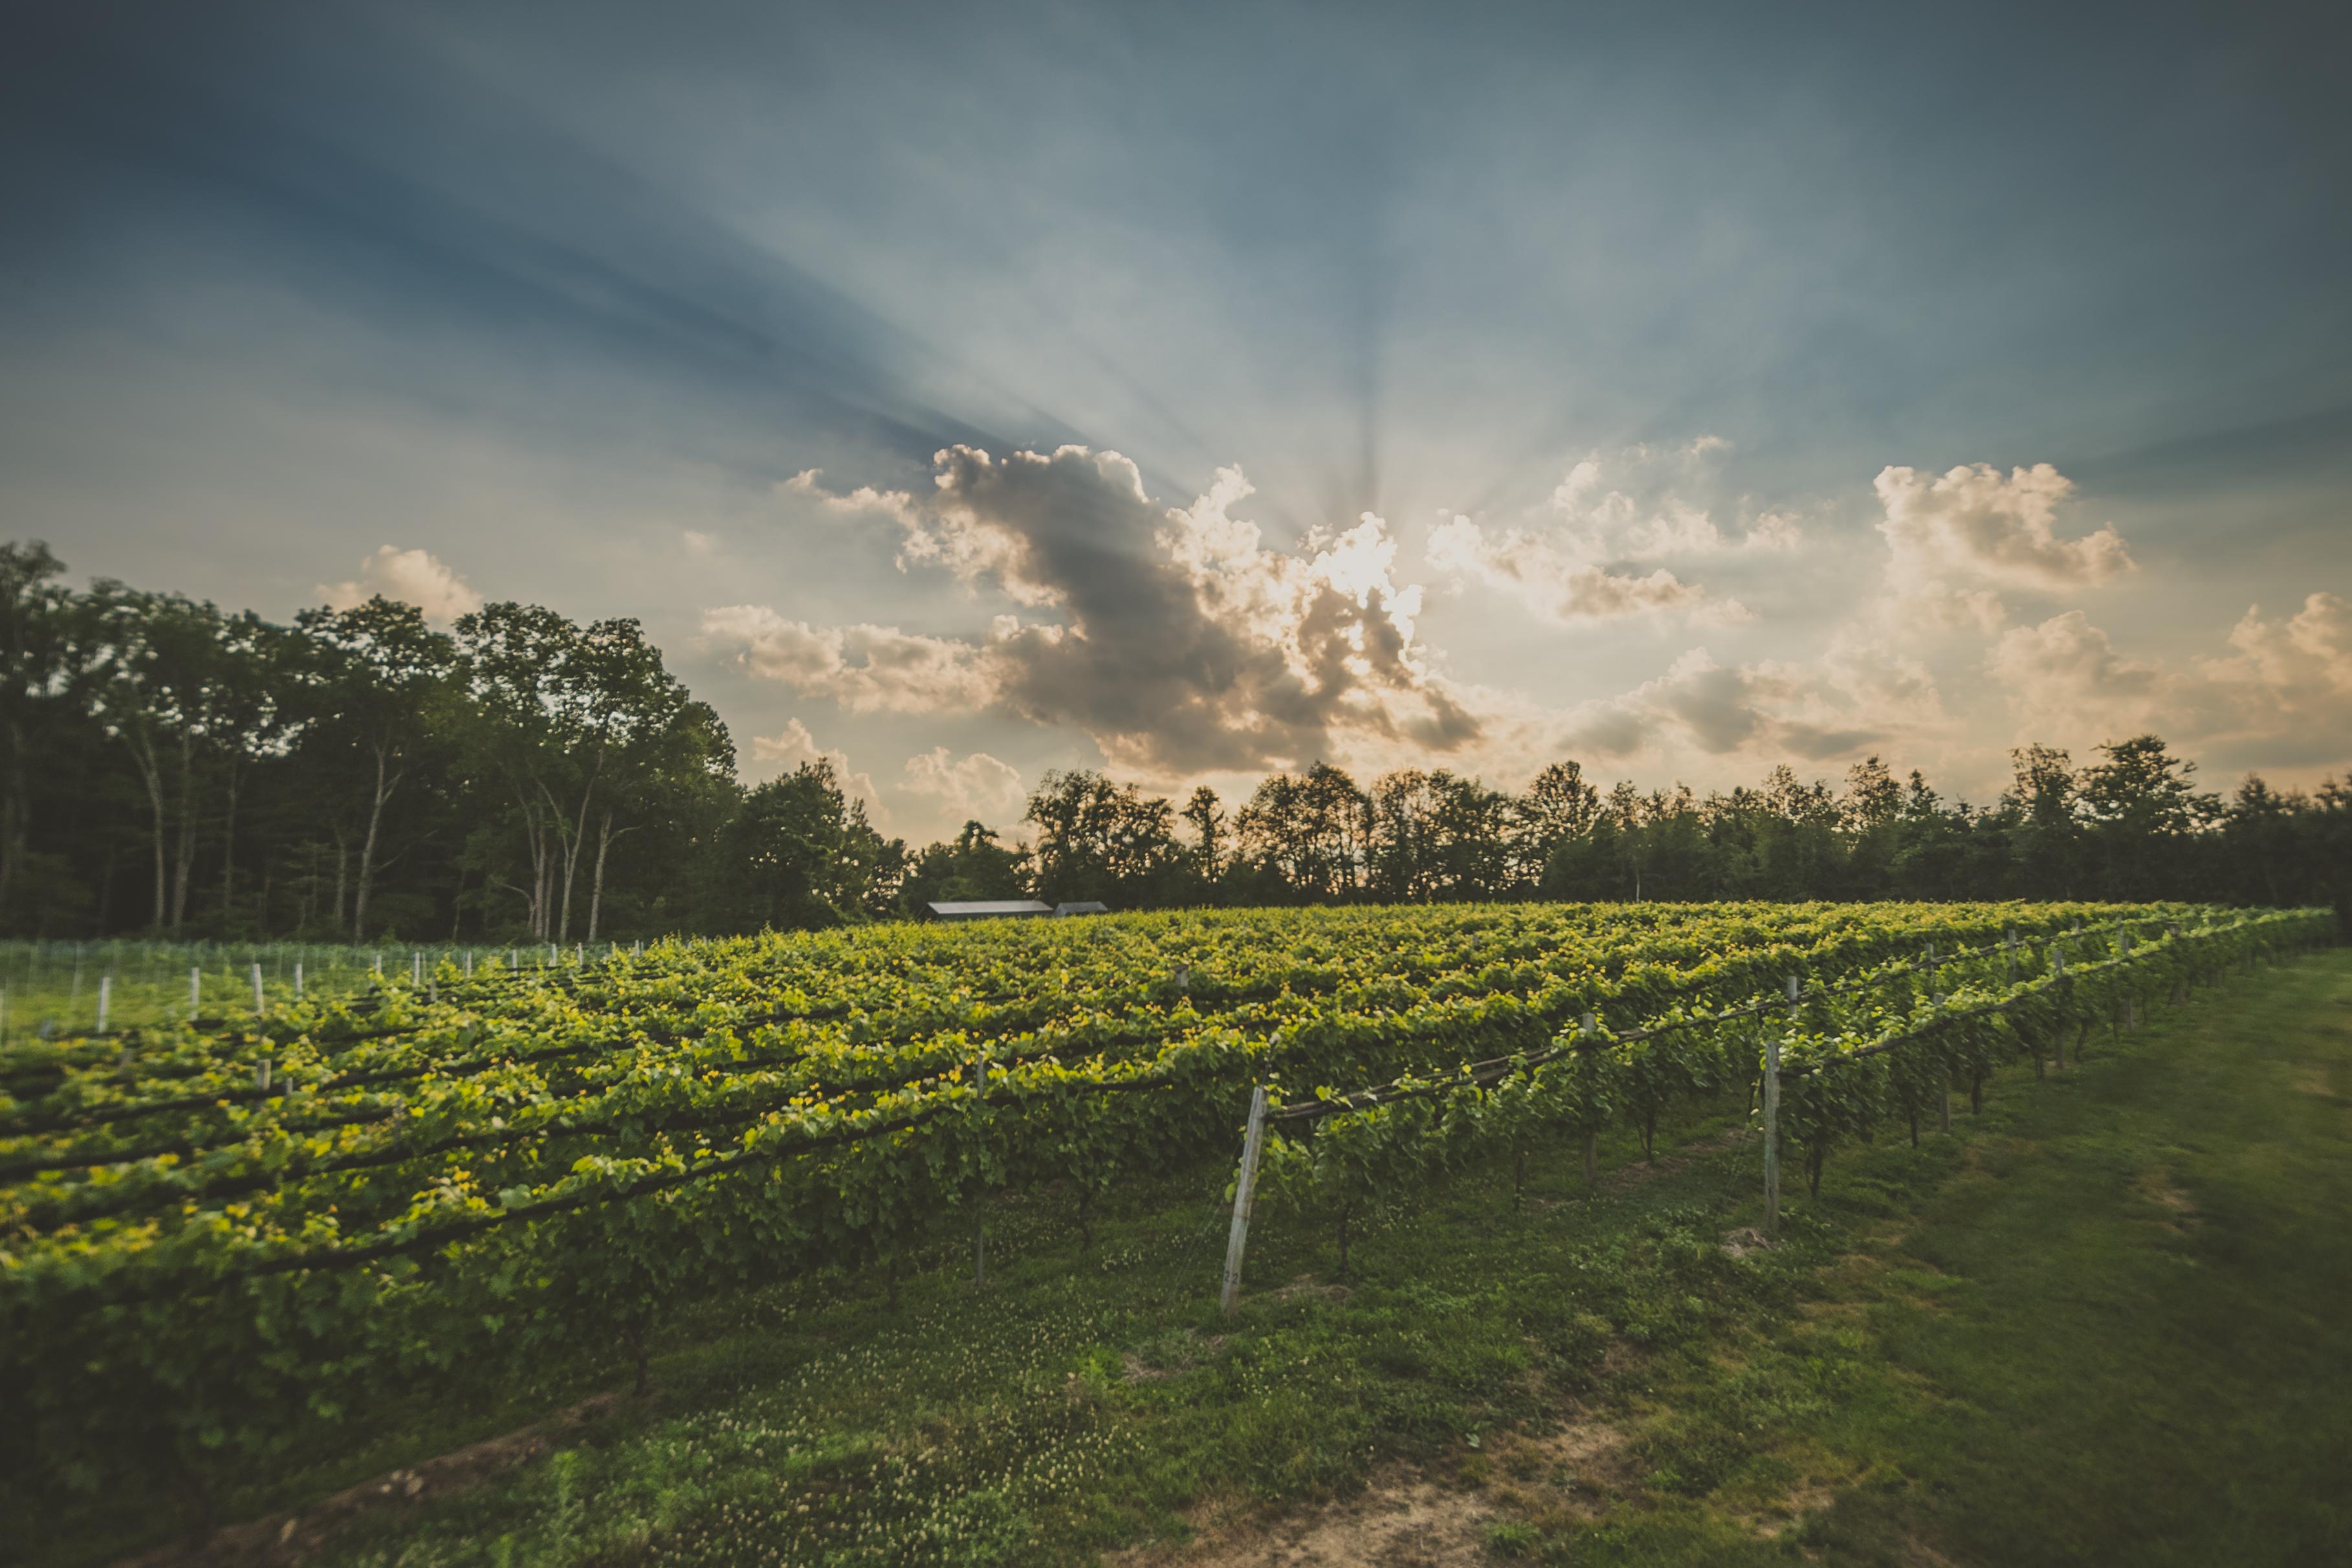 Beautiful sunset over lush wine vineyards